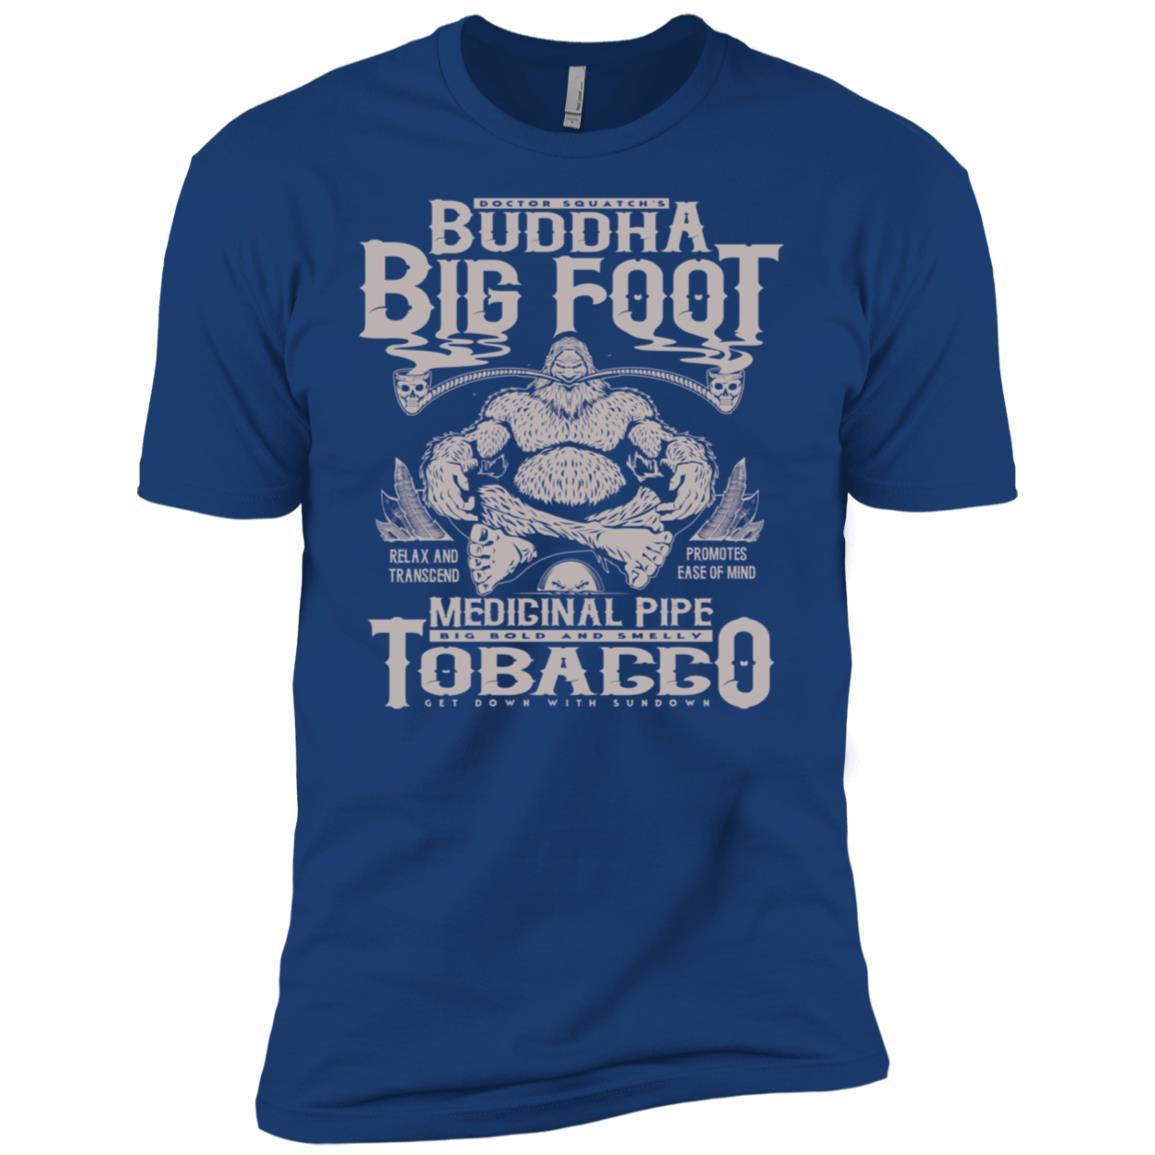 Buddha Bigfoot Medicinal Pipe Tobacco Men Short Sleeve T-Shirt